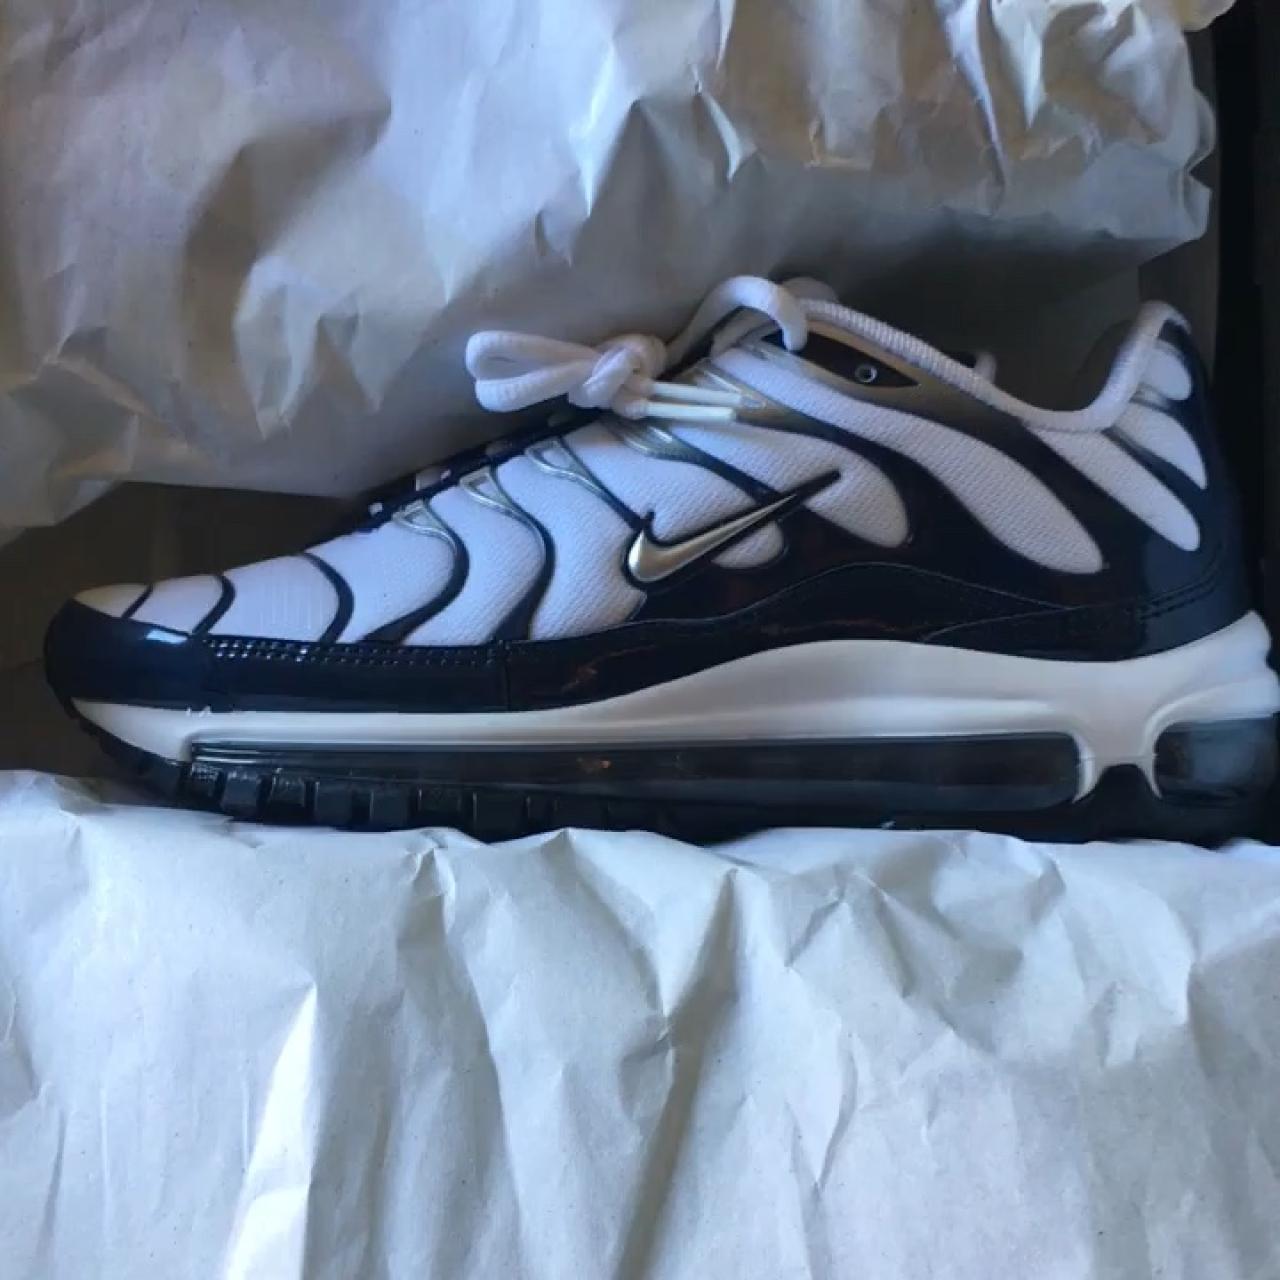 a04f54863b7e06 Nike Air Max 97 plus Silver Shark Size 5.5 in Men. Size 7 - Depop